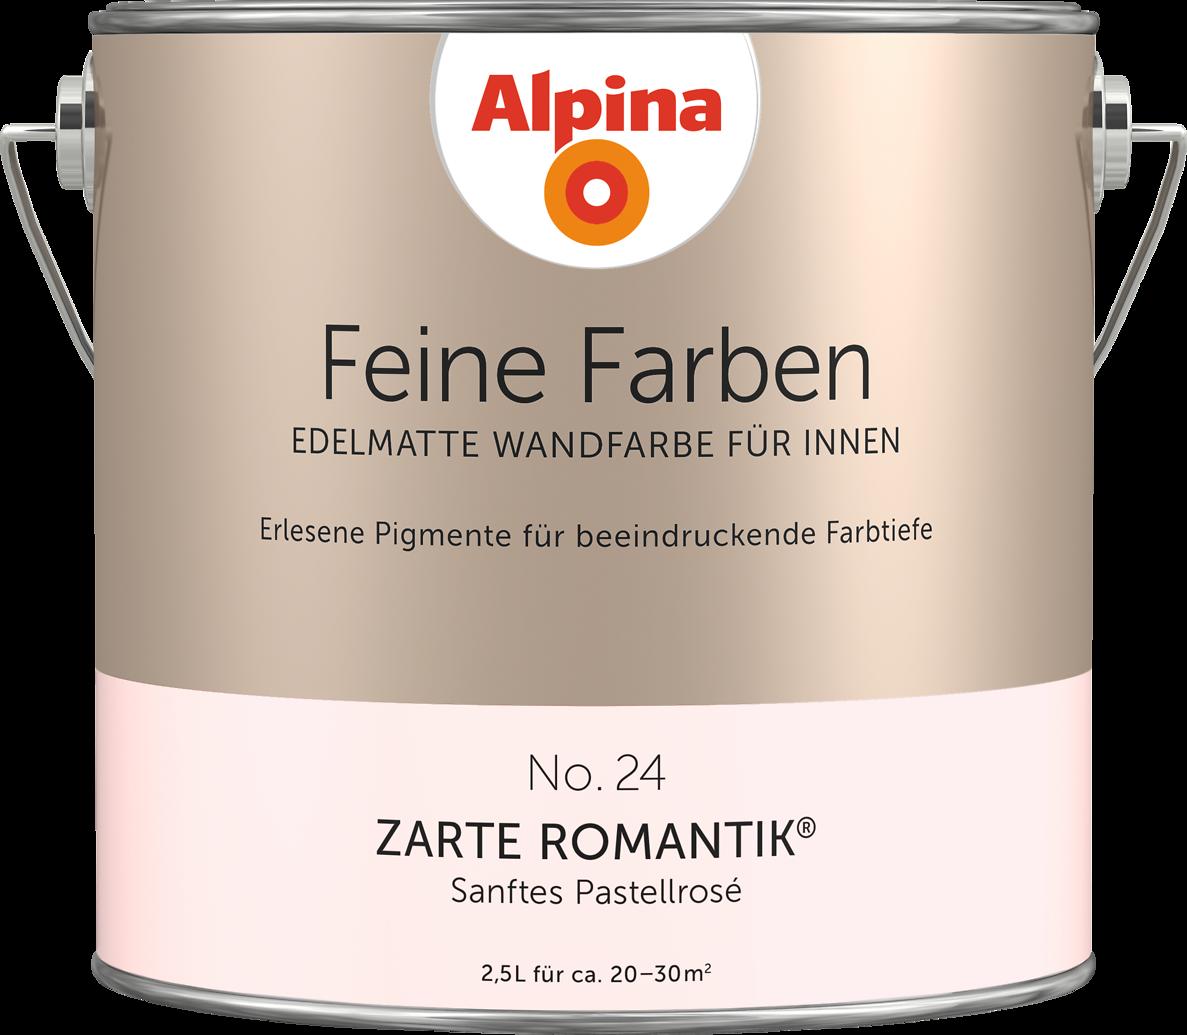 premium wandfarbe rot pastellros alpina feine farben zarte romantik alpina farben. Black Bedroom Furniture Sets. Home Design Ideas